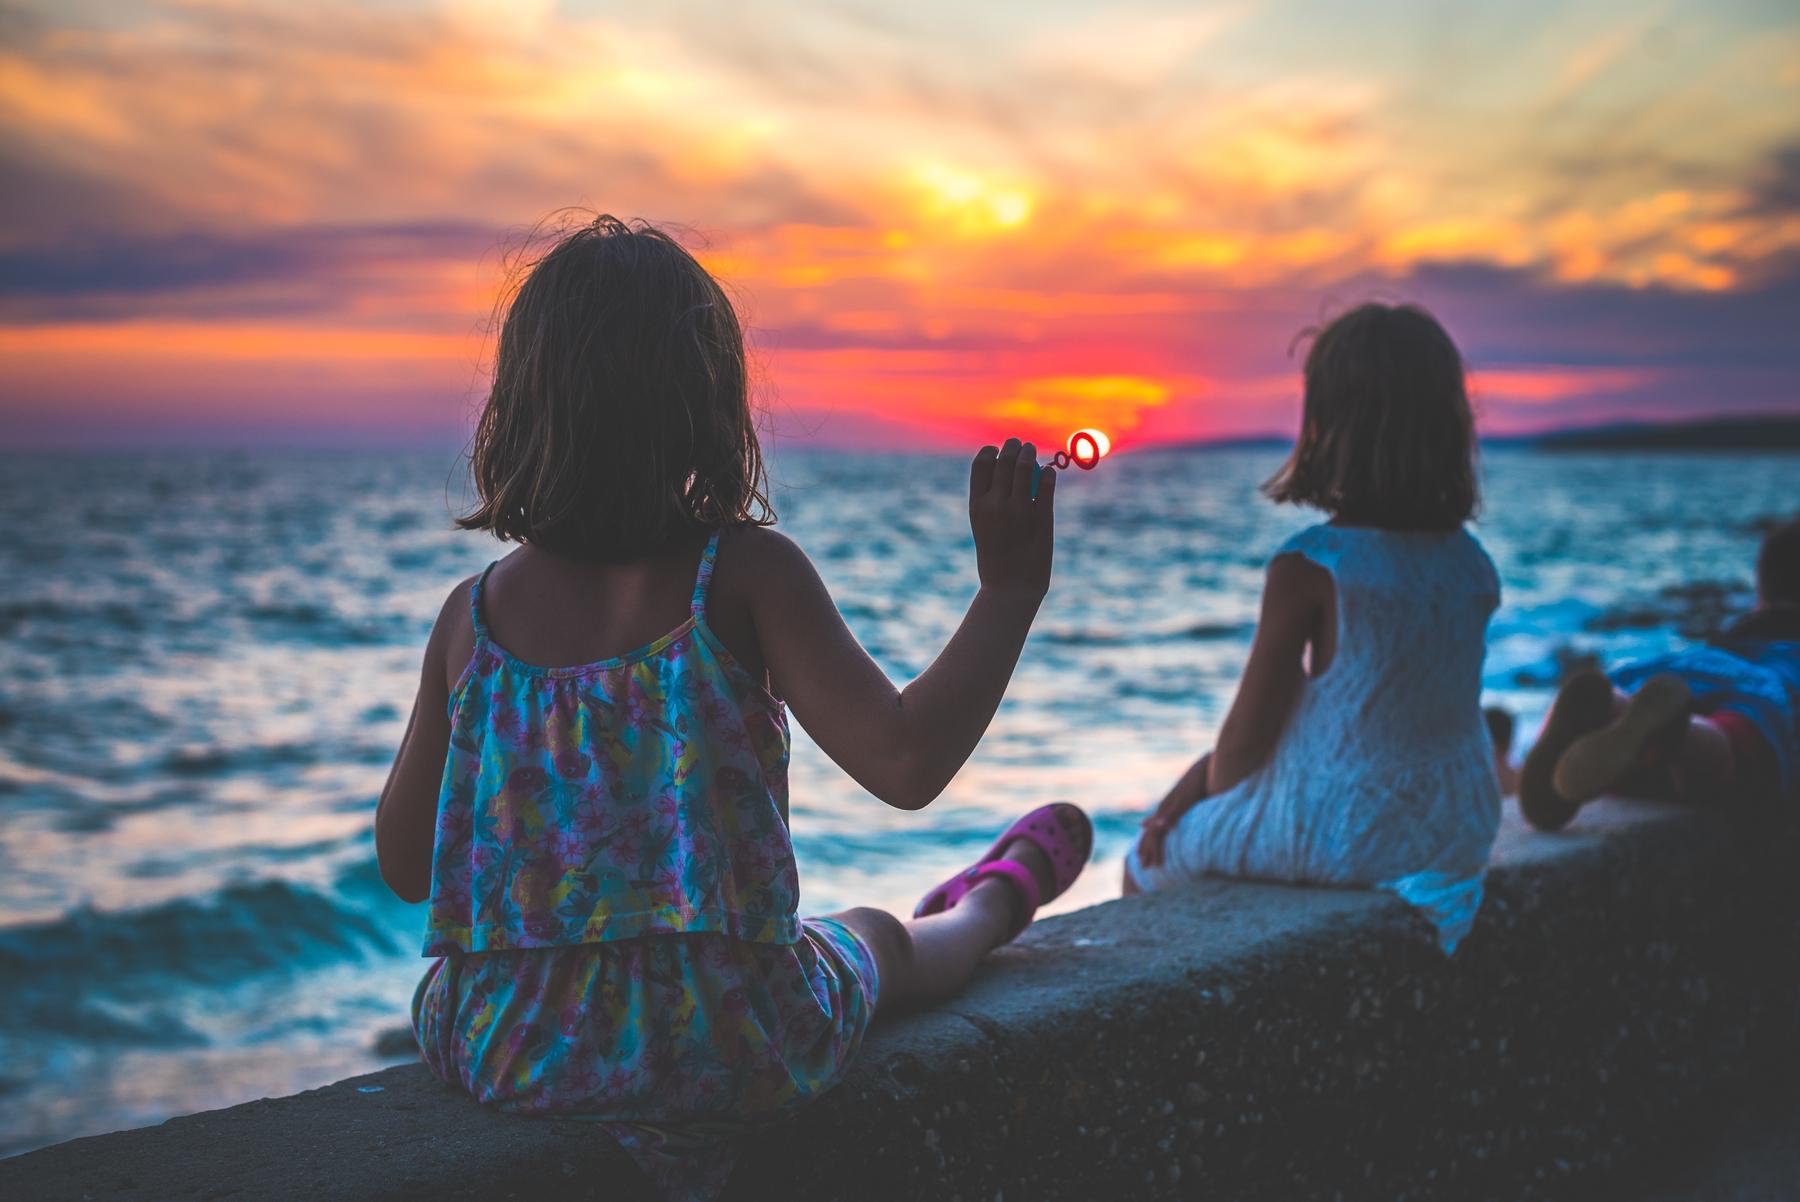 Two young girls watching the sunset in Croatia